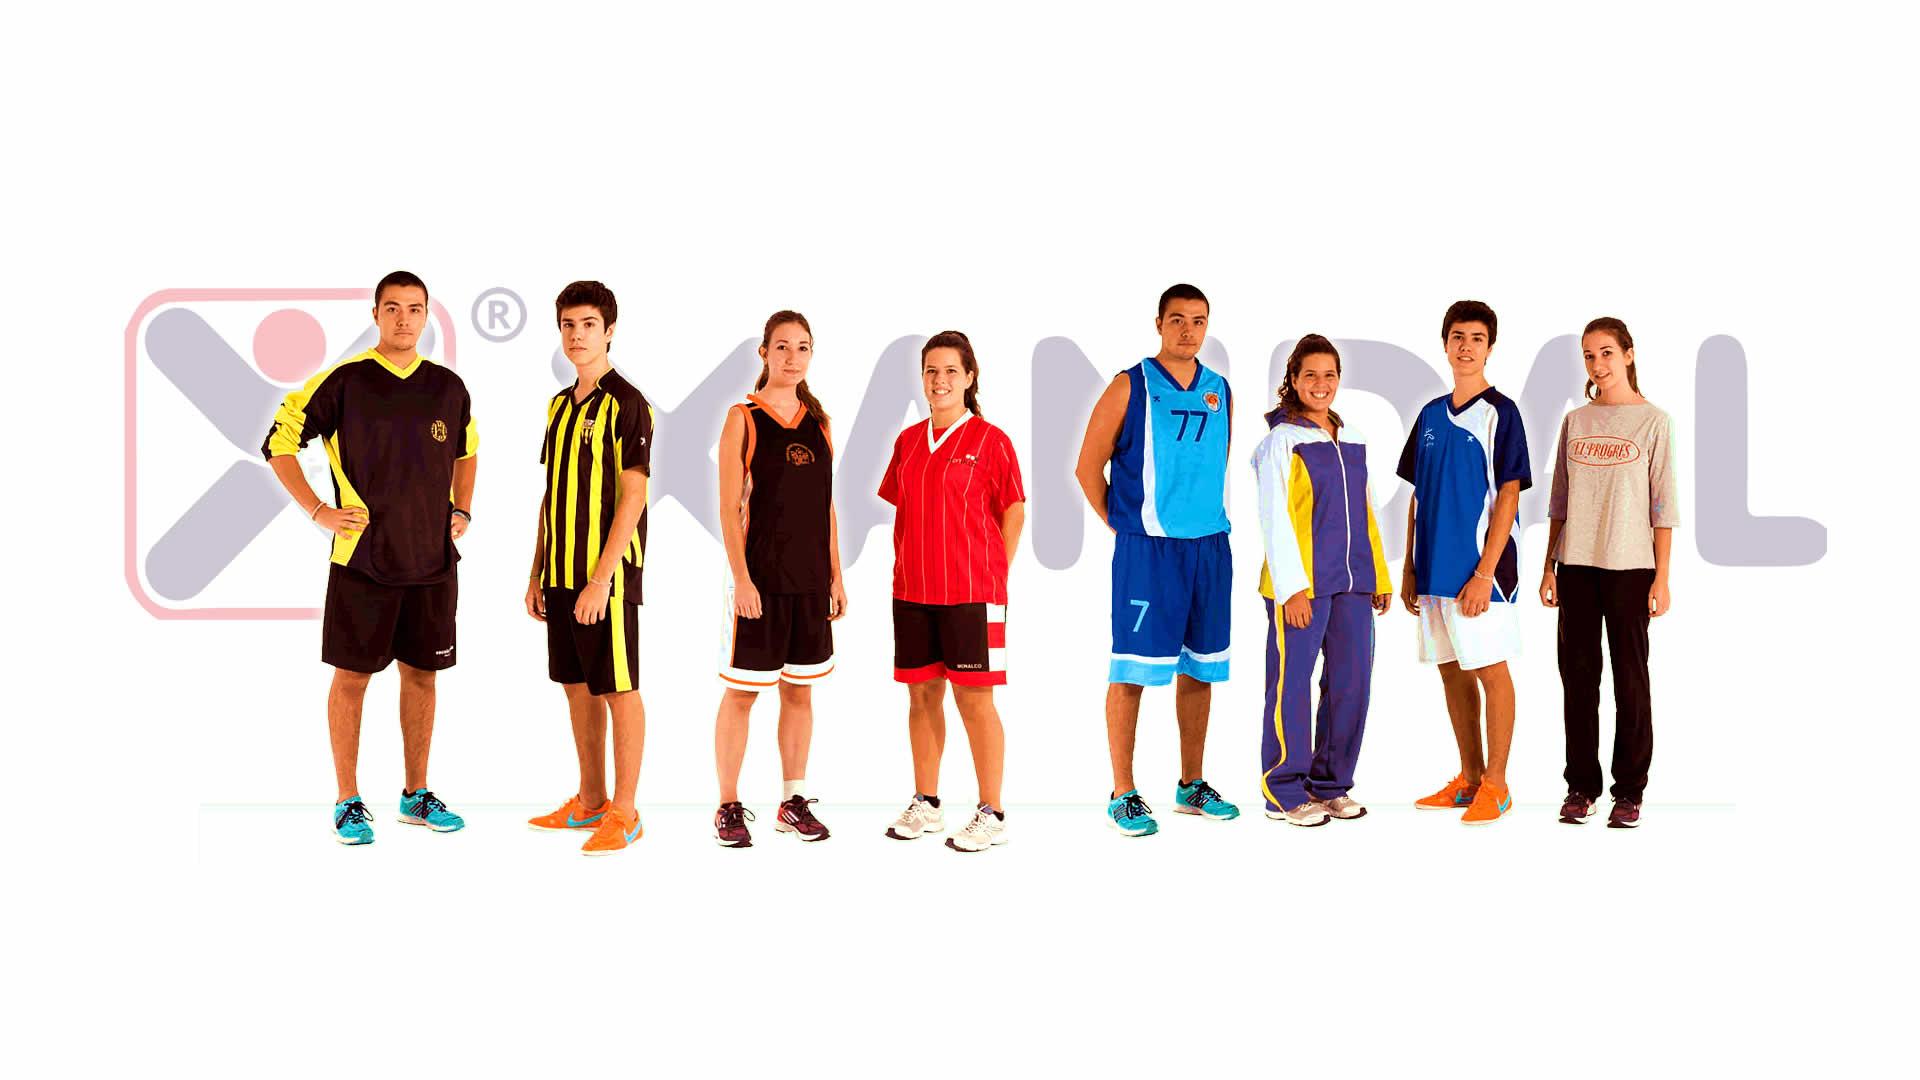 xandal.com-xandal.com-slide01 Roba escolar i roba esportiva a mida